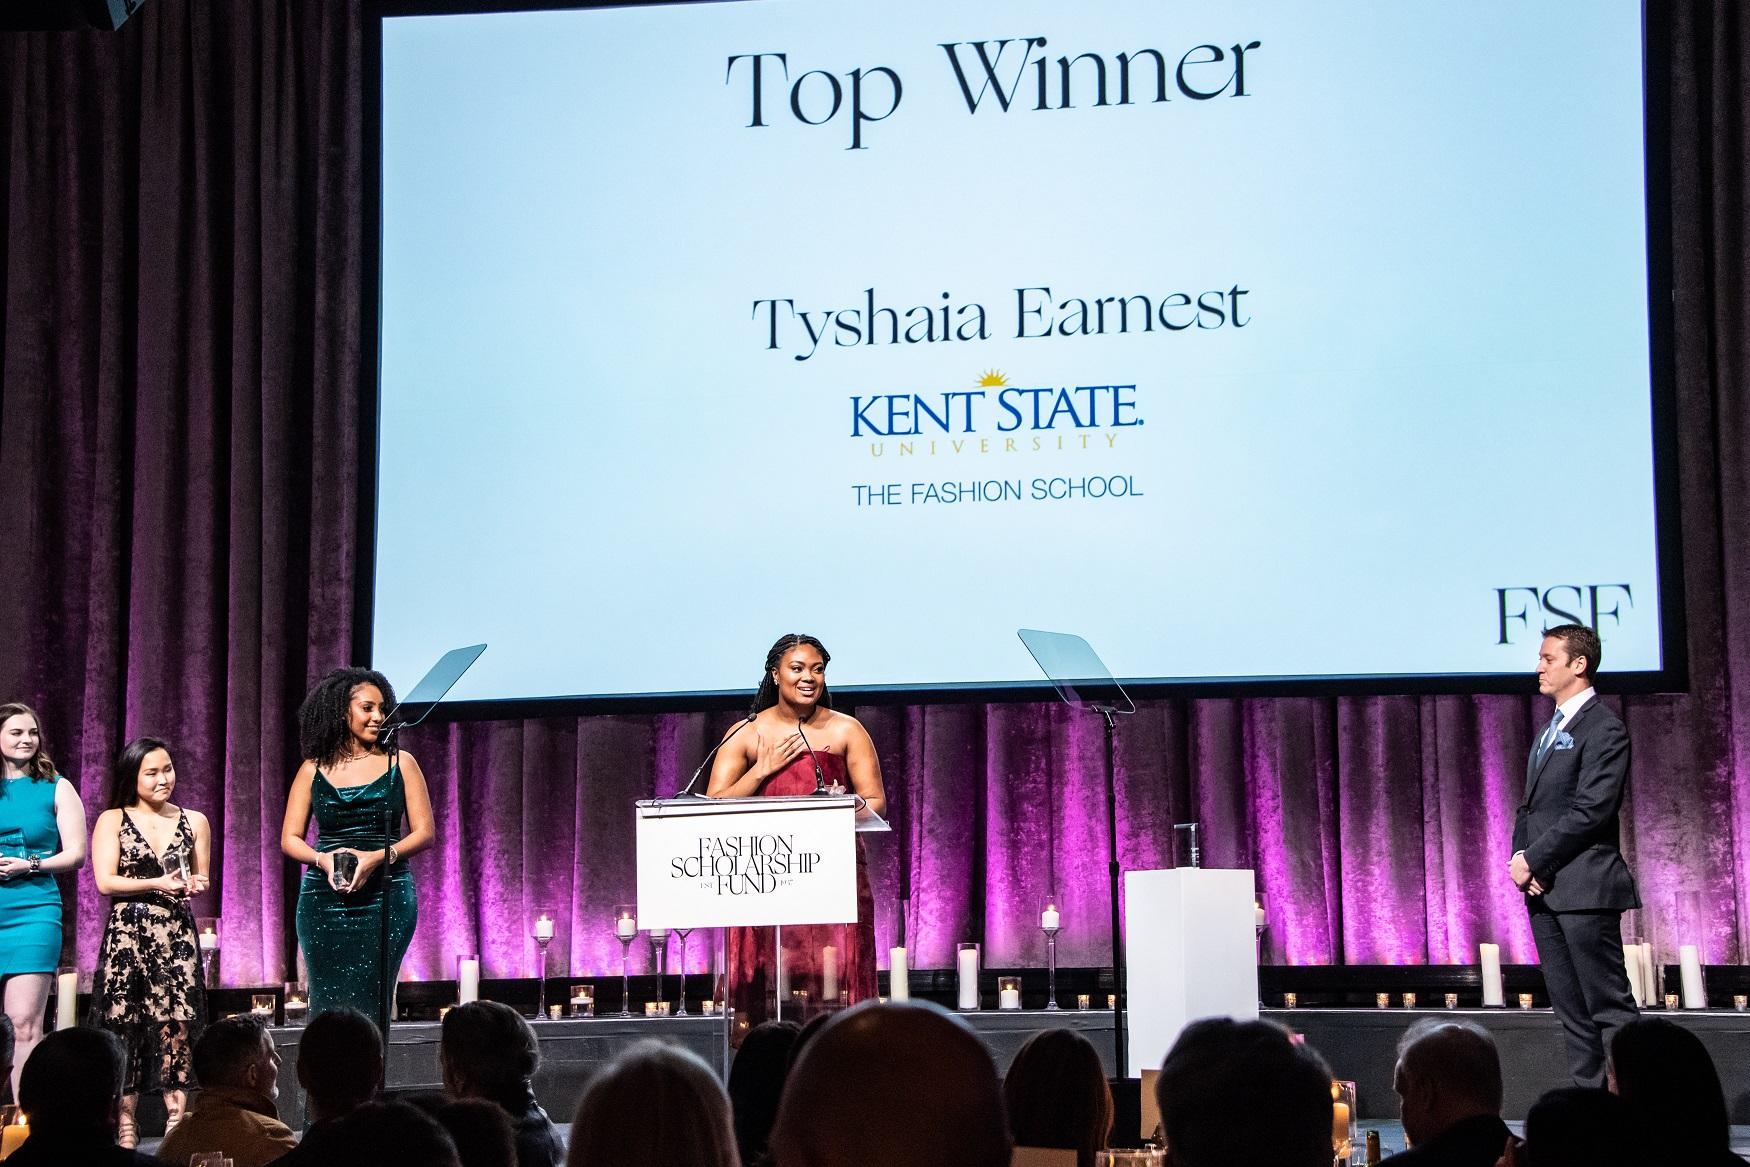 Kent State Fashion Merchandising Student Wins Grand Prize At Fashion Scholarship Fund Gala In Nyc Kent State University